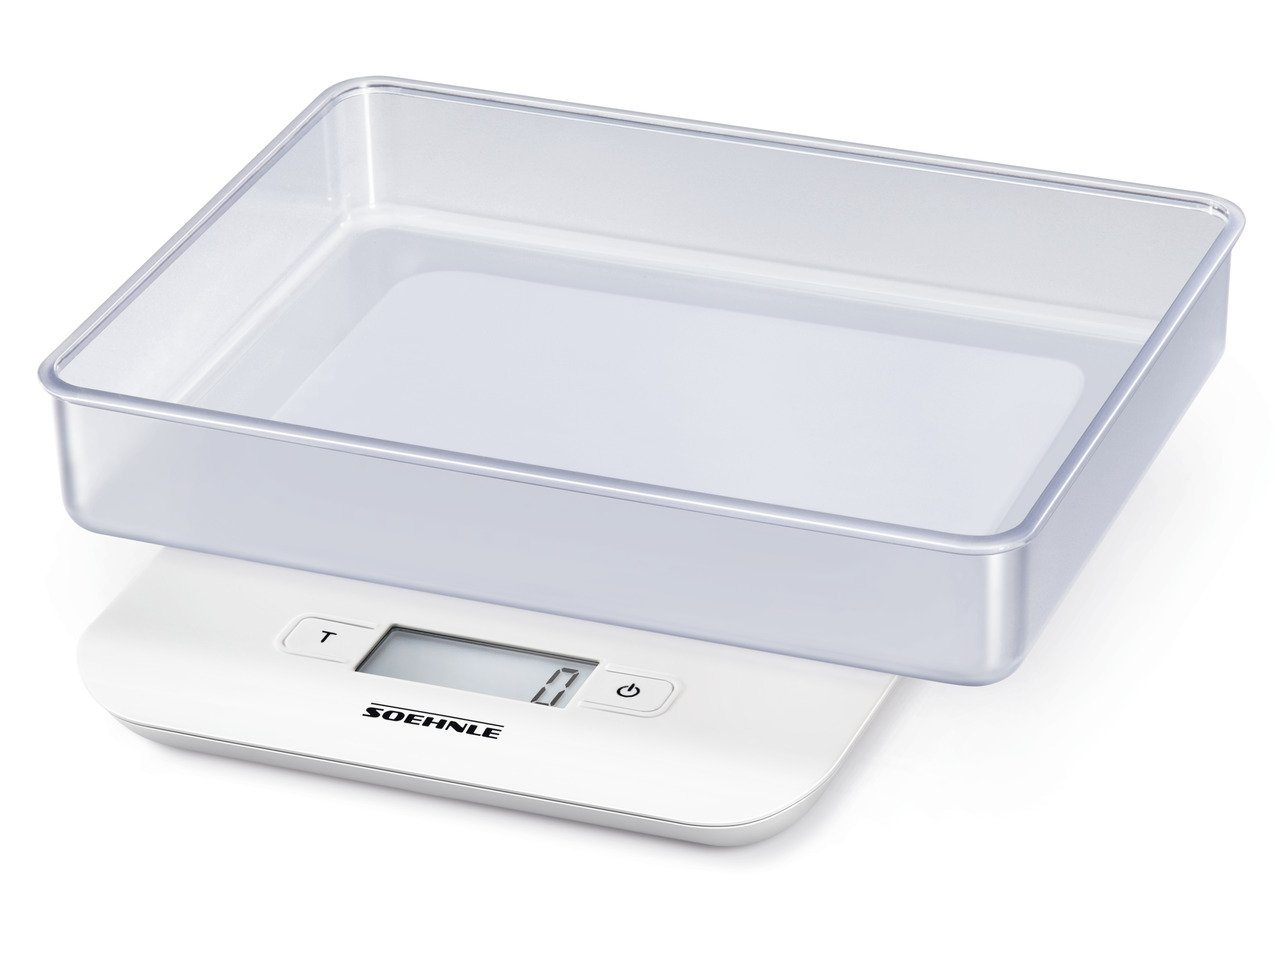 Soehnle 65122 Pesa alimenti elettronica Compact 5 kg